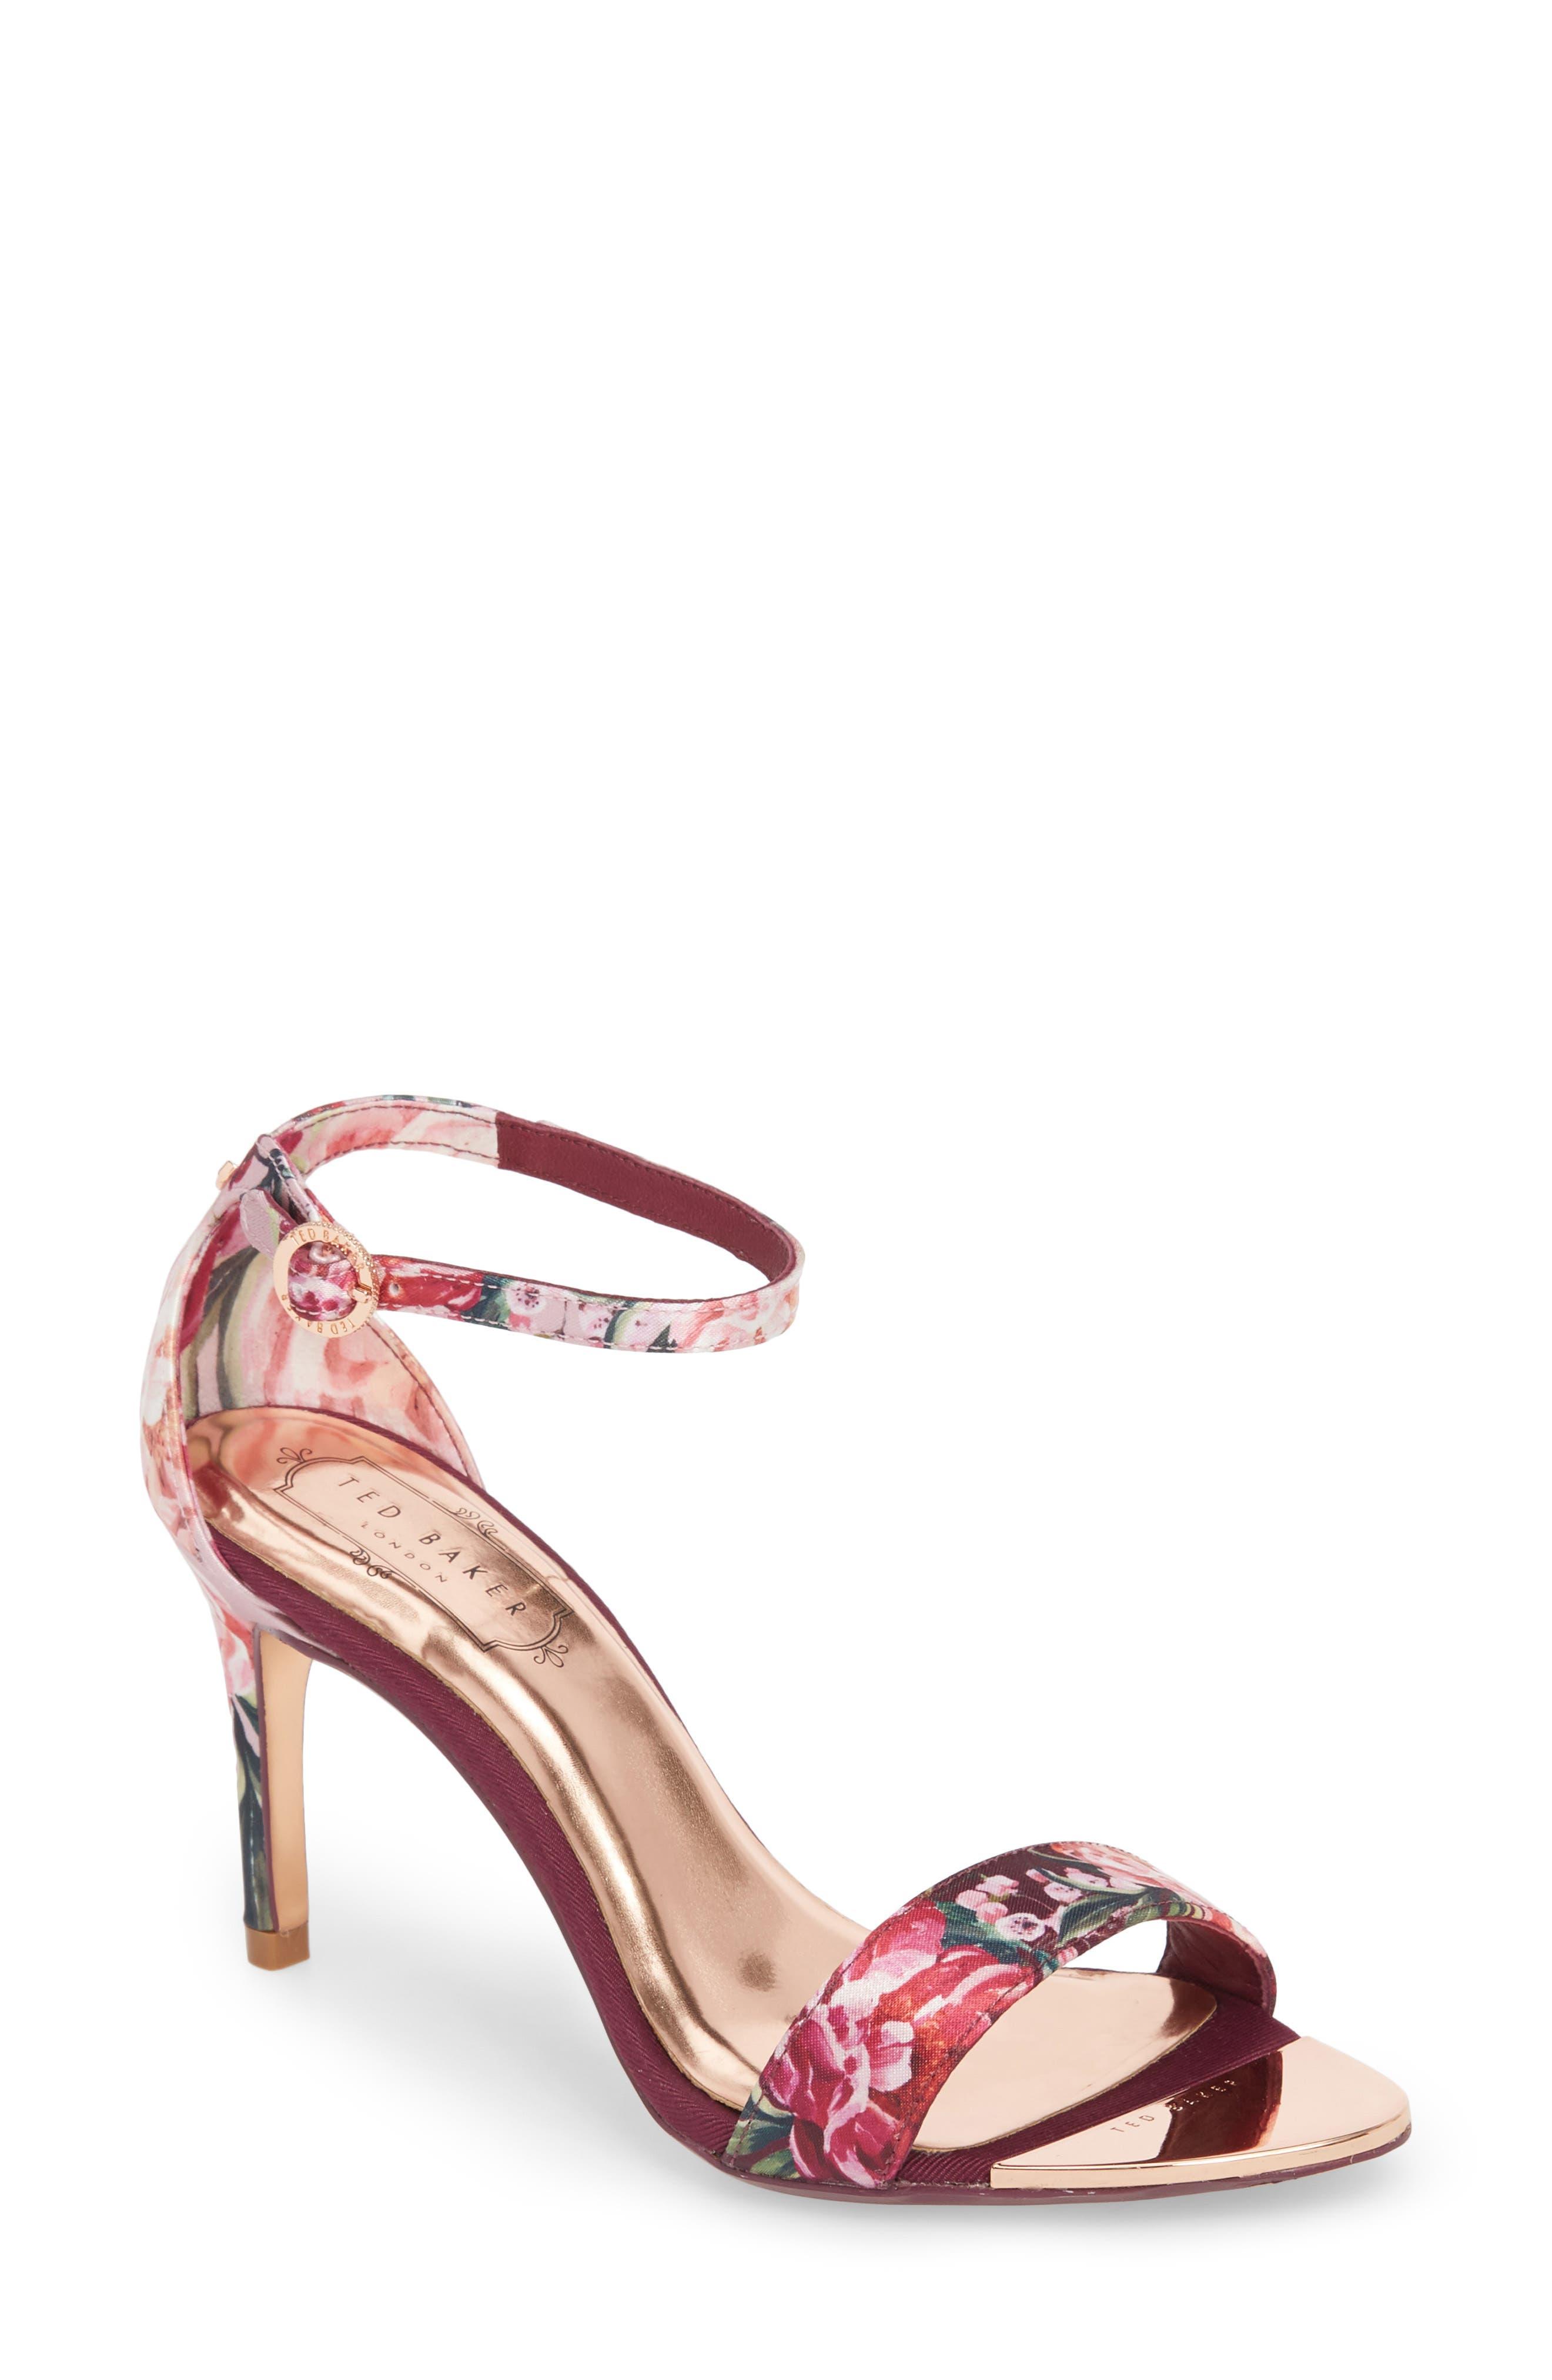 Mylli Sandal,                         Main,                         color, Serenity Satin